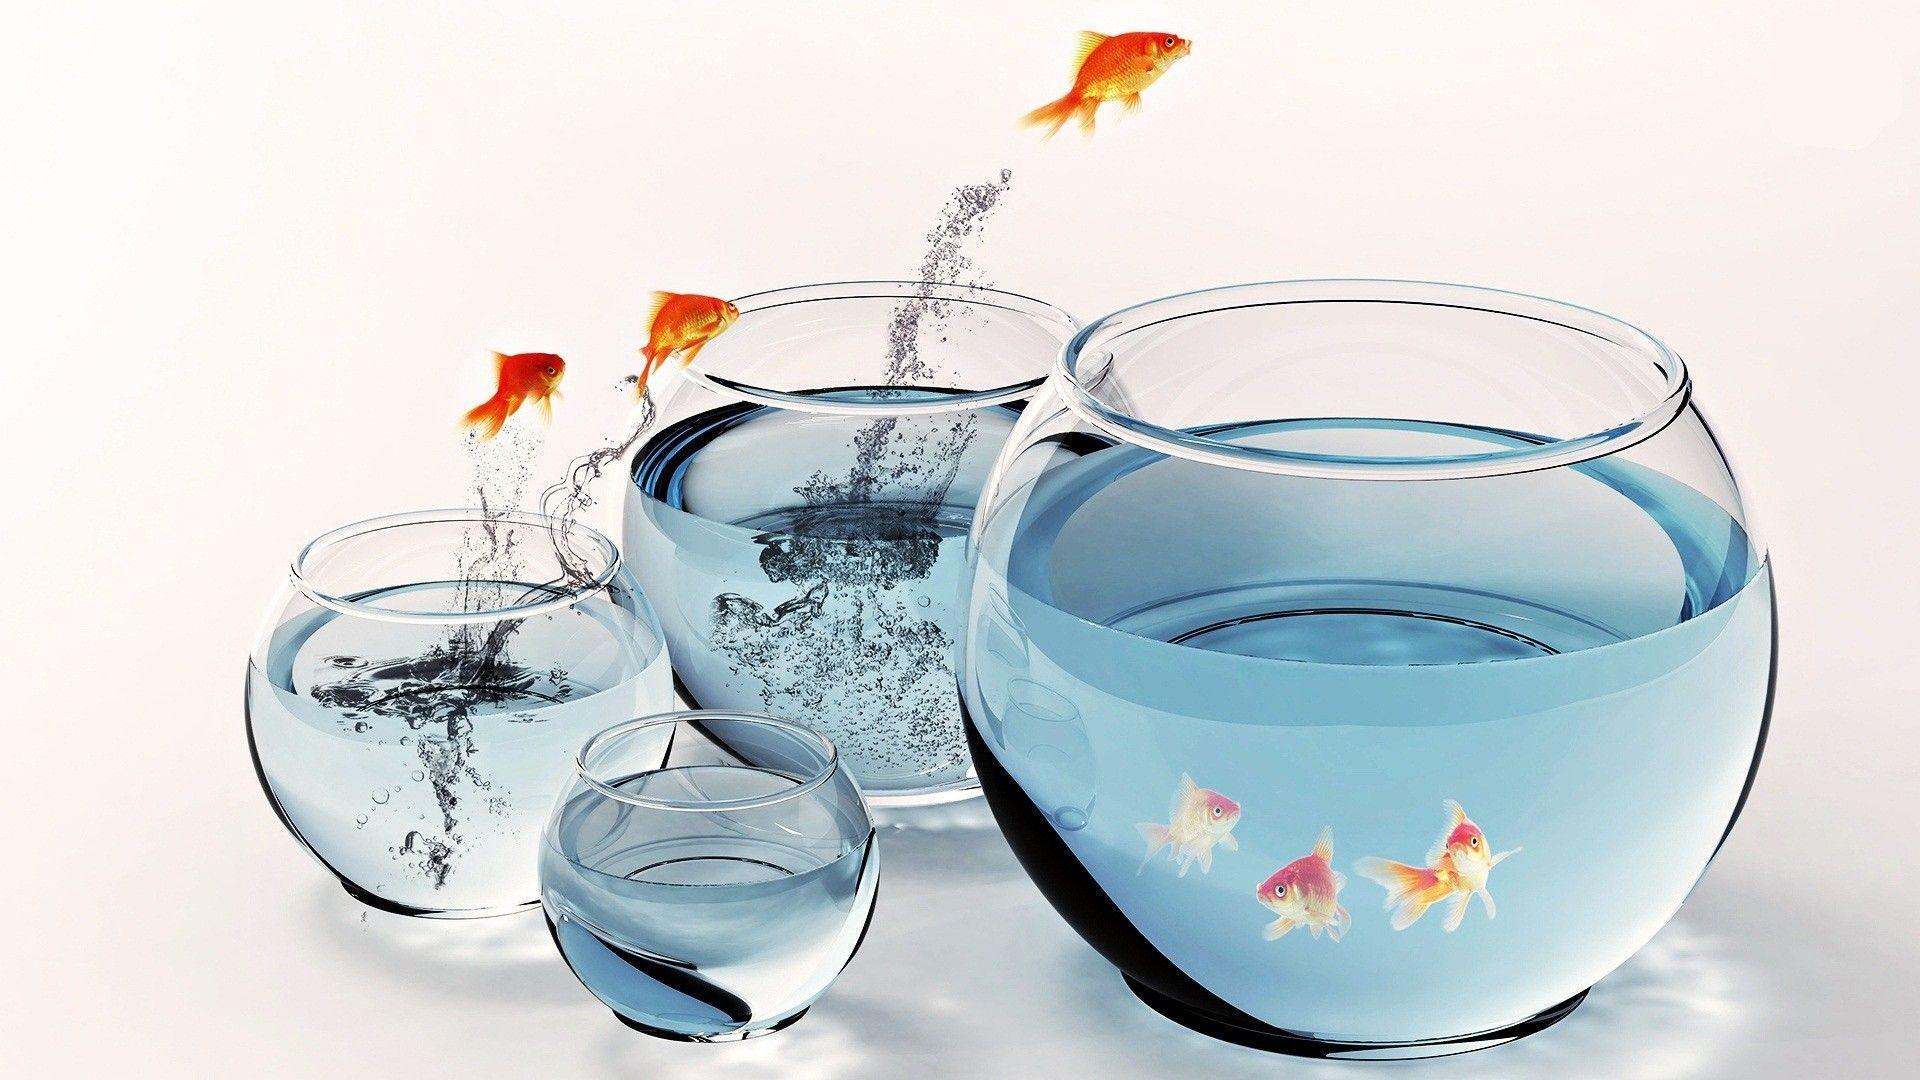 Fish aquarium kidderminster - Fish In Aquarium Desktop Wallpaper